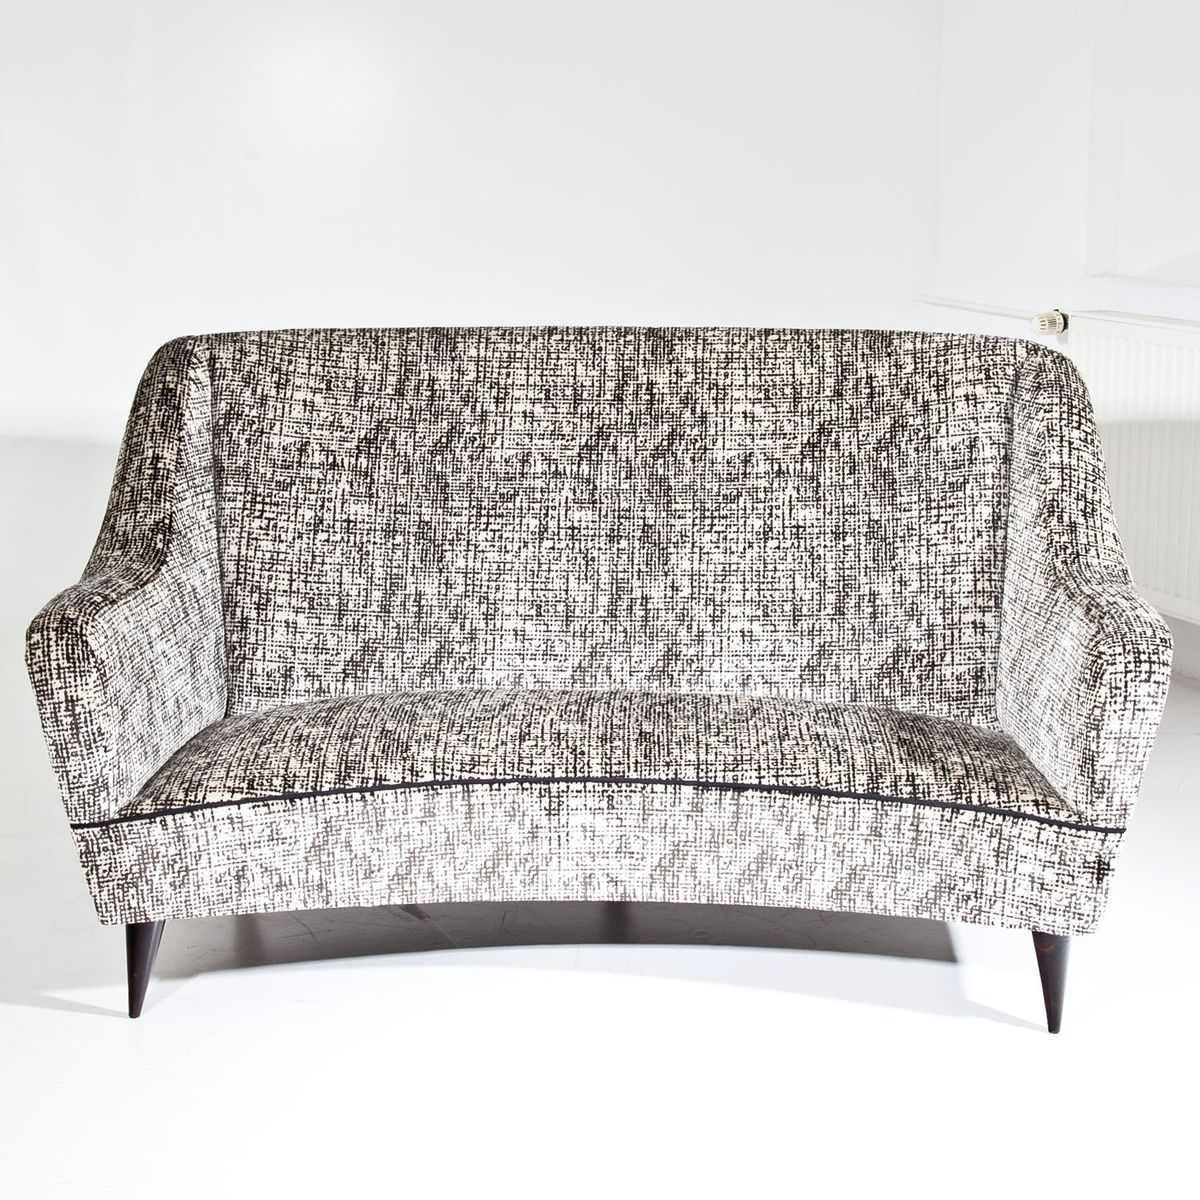 vintage sofa bei pamono kaufen. Black Bedroom Furniture Sets. Home Design Ideas